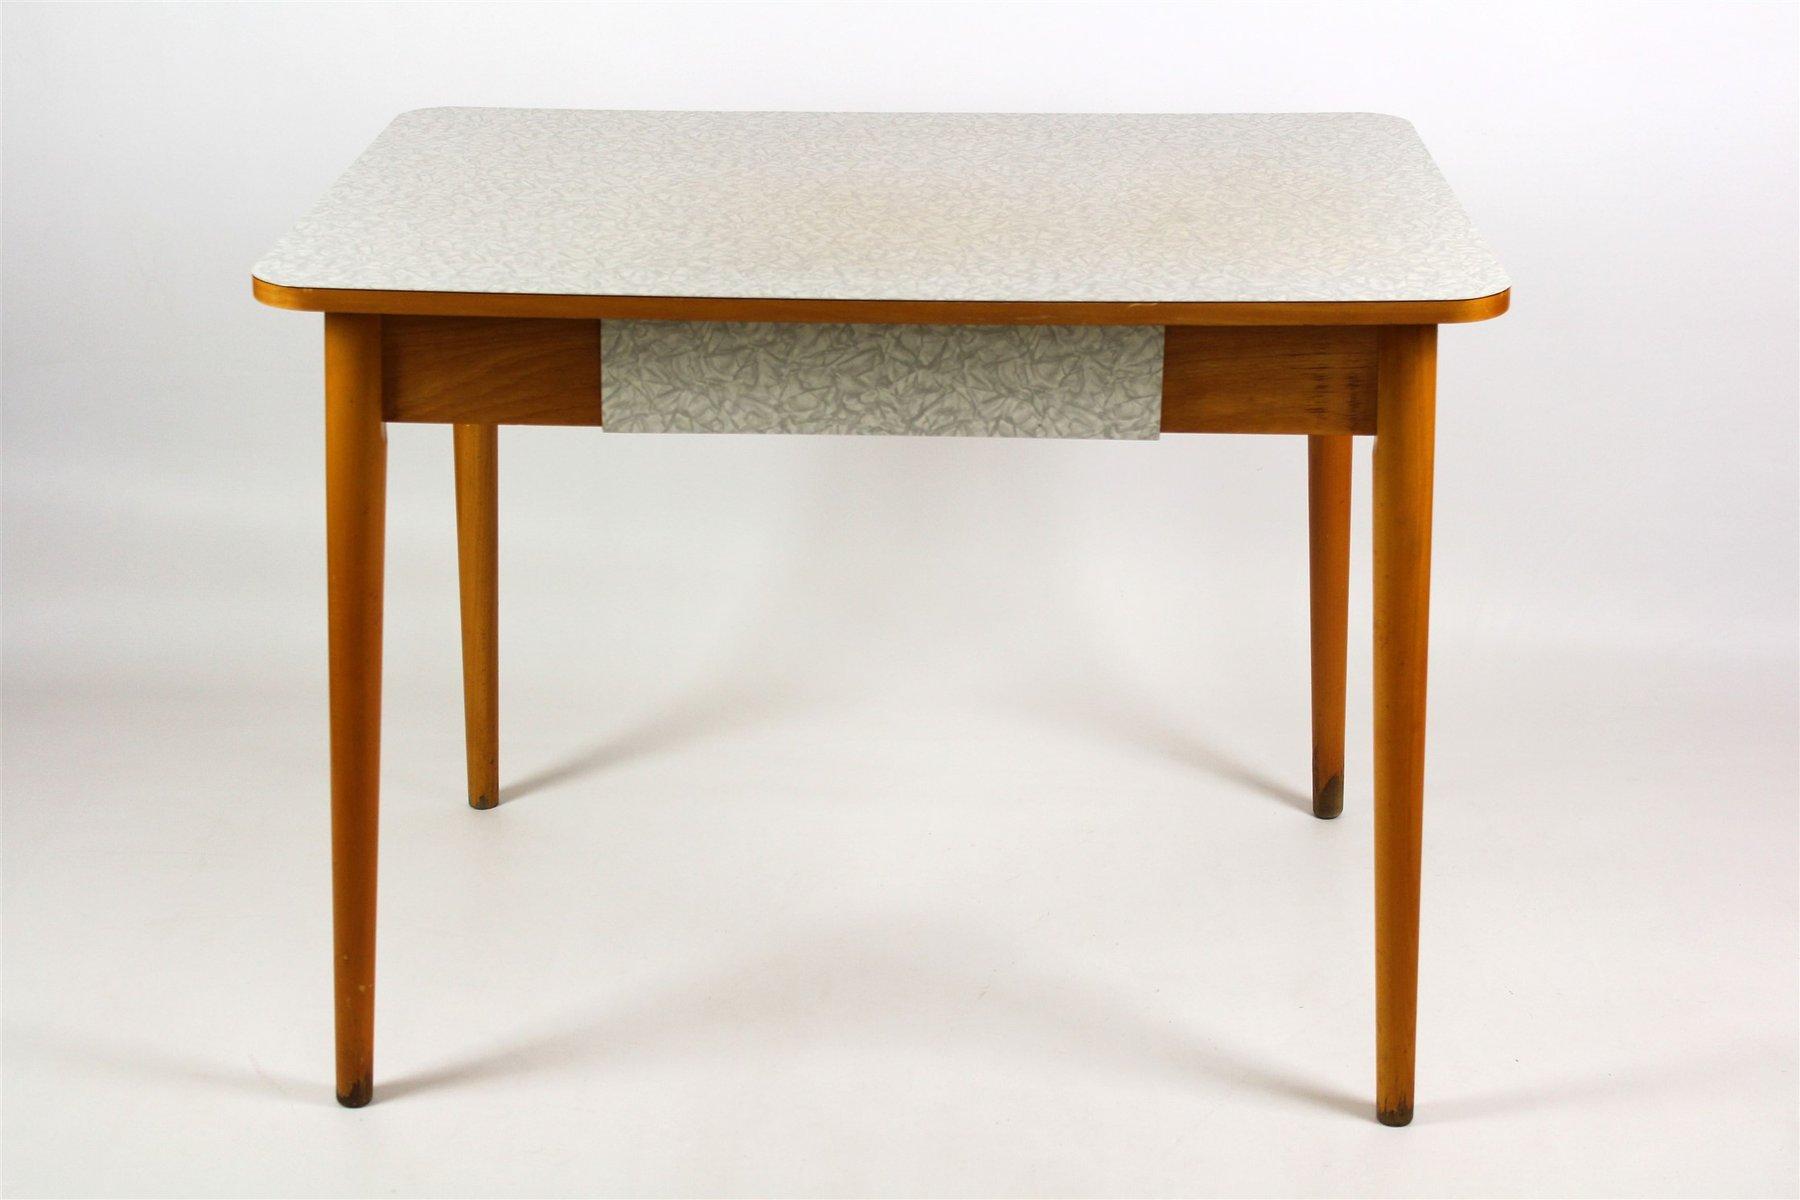 Tavolo da cucina in legno di formica di Jitona, anni \'60 in vendita ...